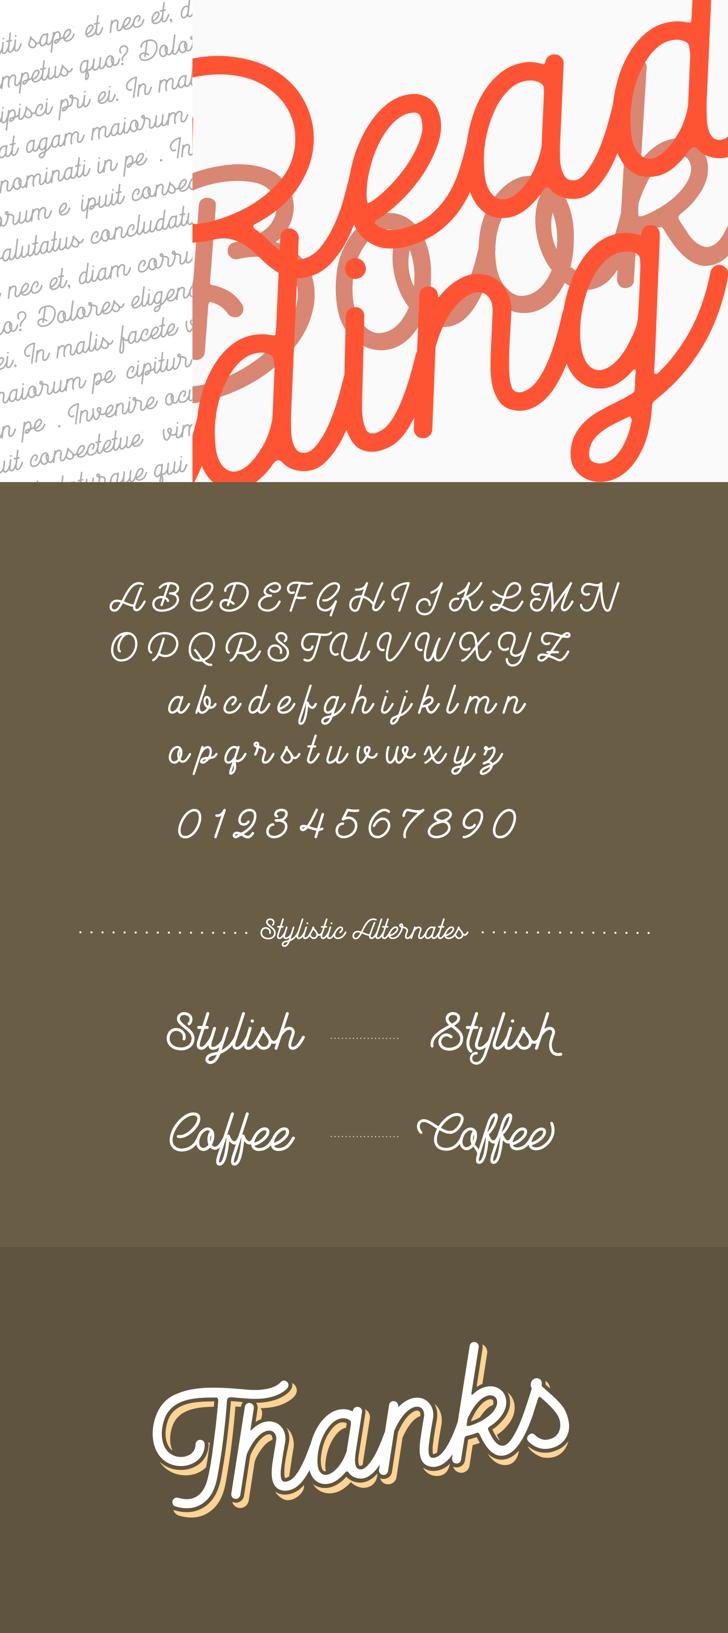 Goldana Base Font screenshot text